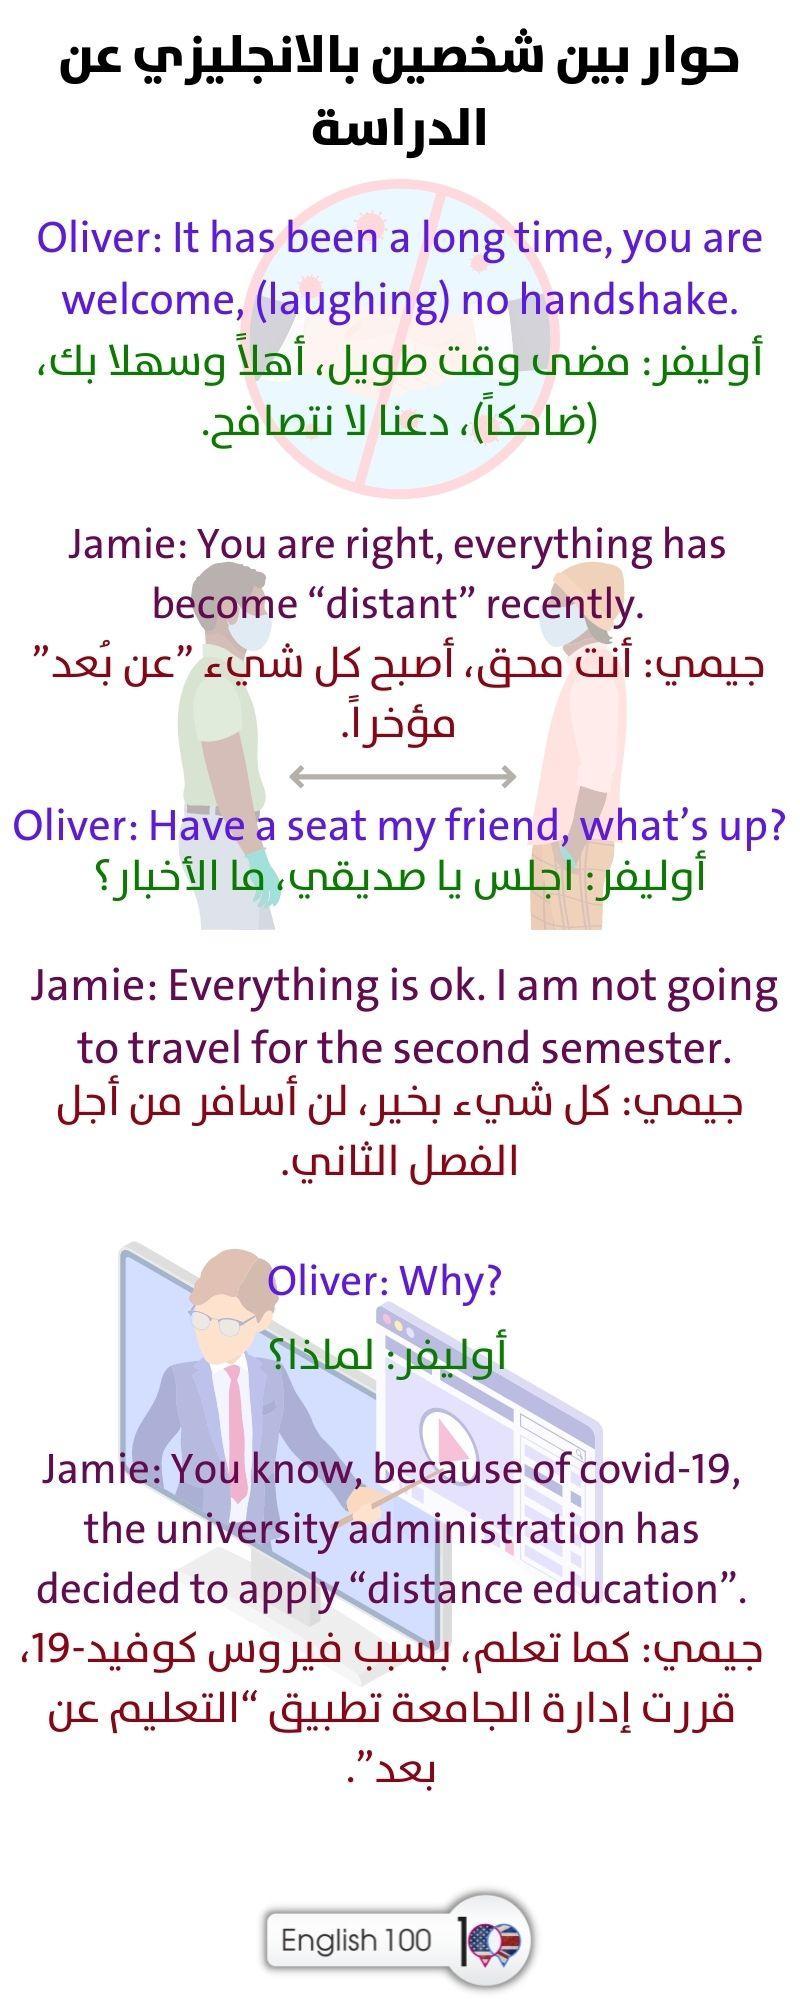 حوار بين شخصين بالانجليزي عن الدراسة A Dialogue between Two Persons in English about Studying